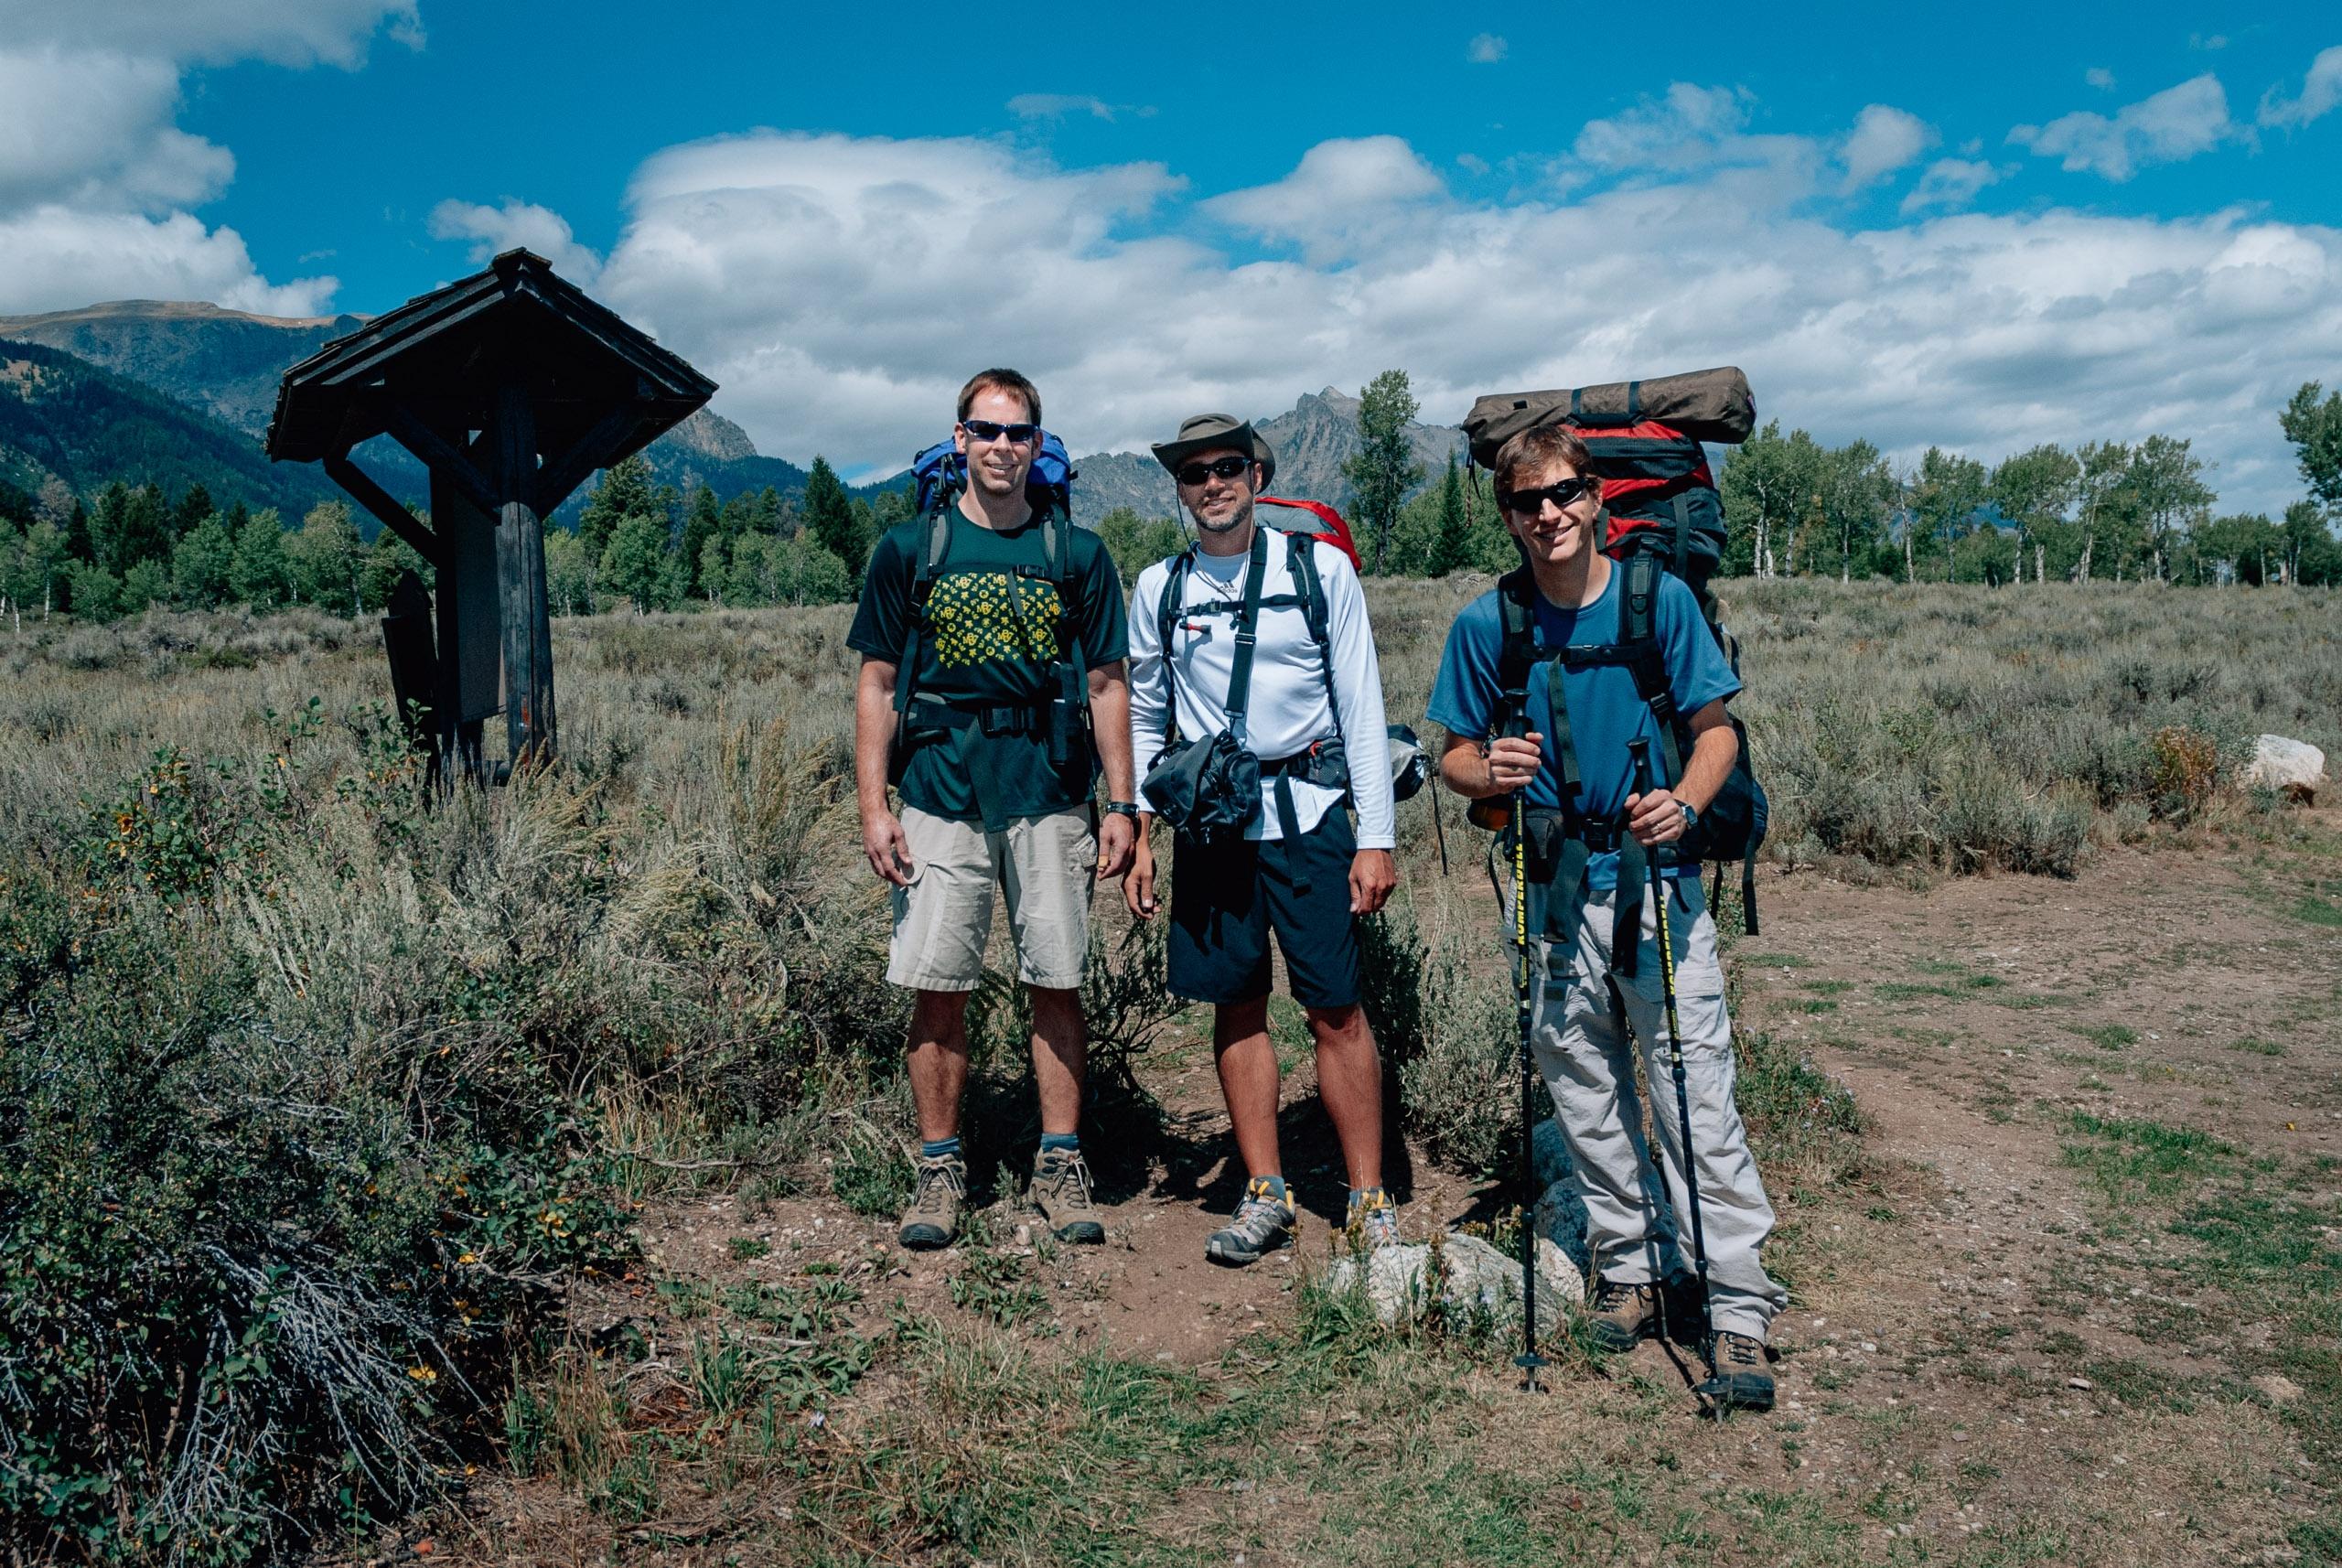 Grand Teton National Park - 2007-0830-DSC_0010_70640